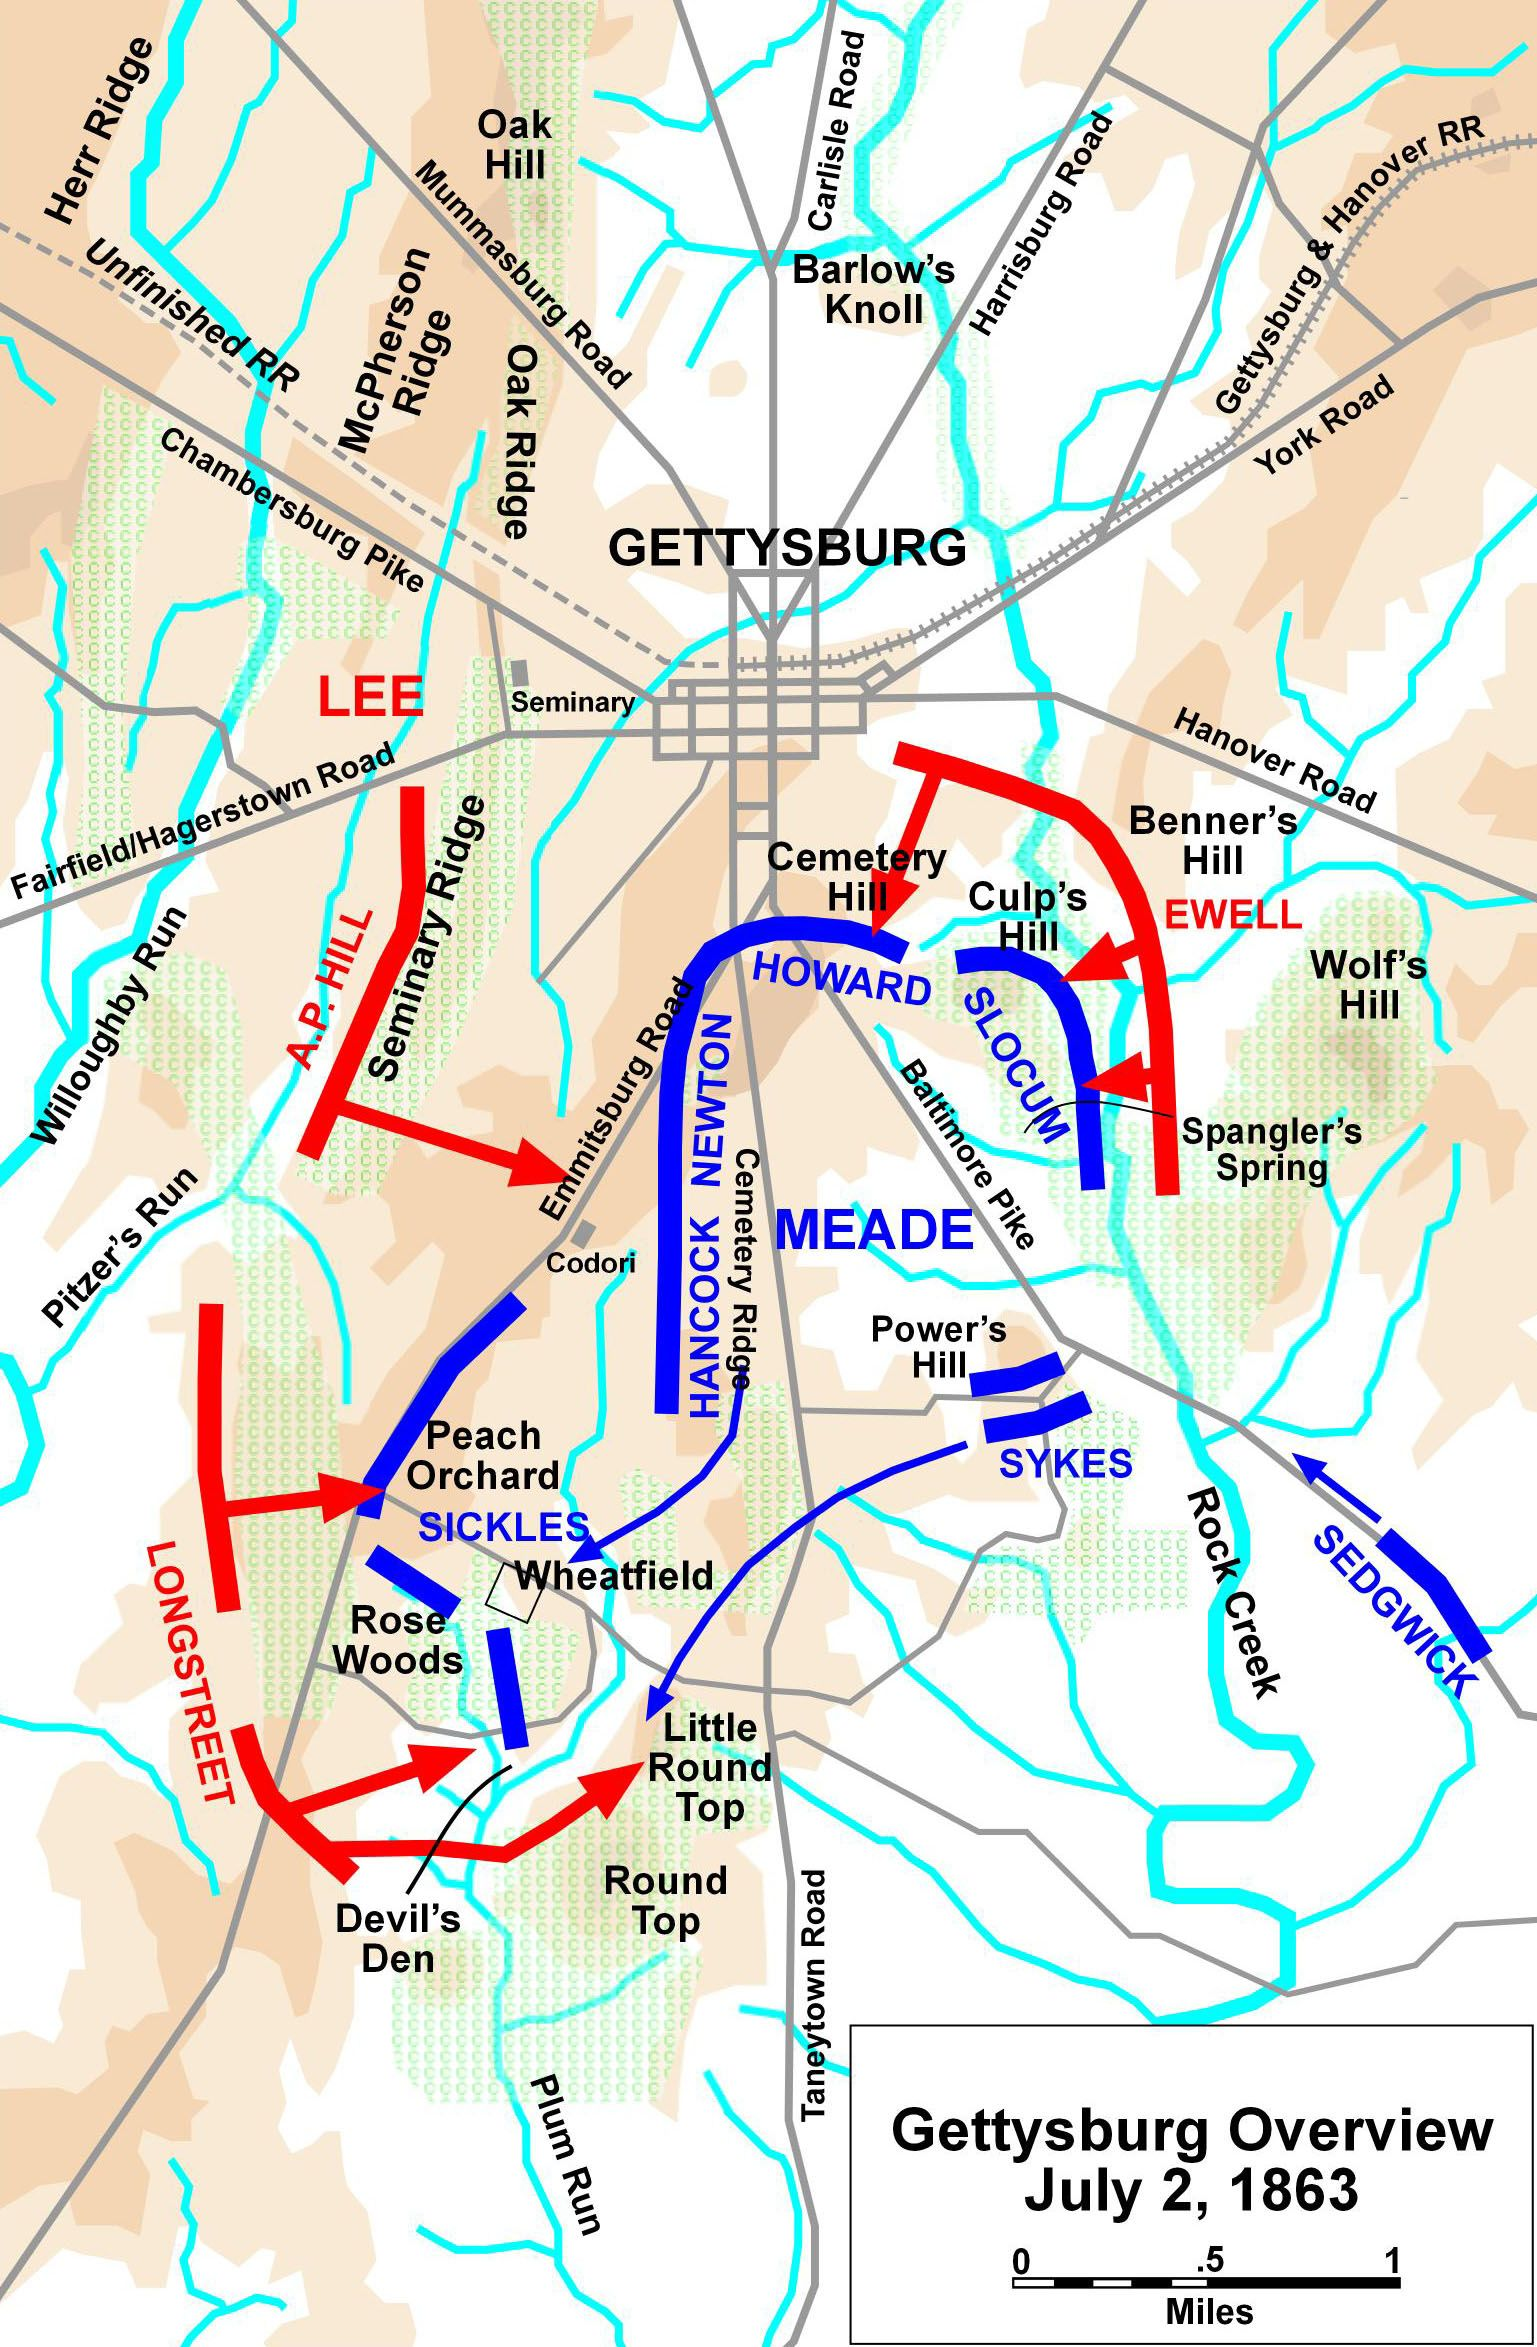 Battle Of Gettysburg July Gettysburg The Iron - Battle of gettysburg us map